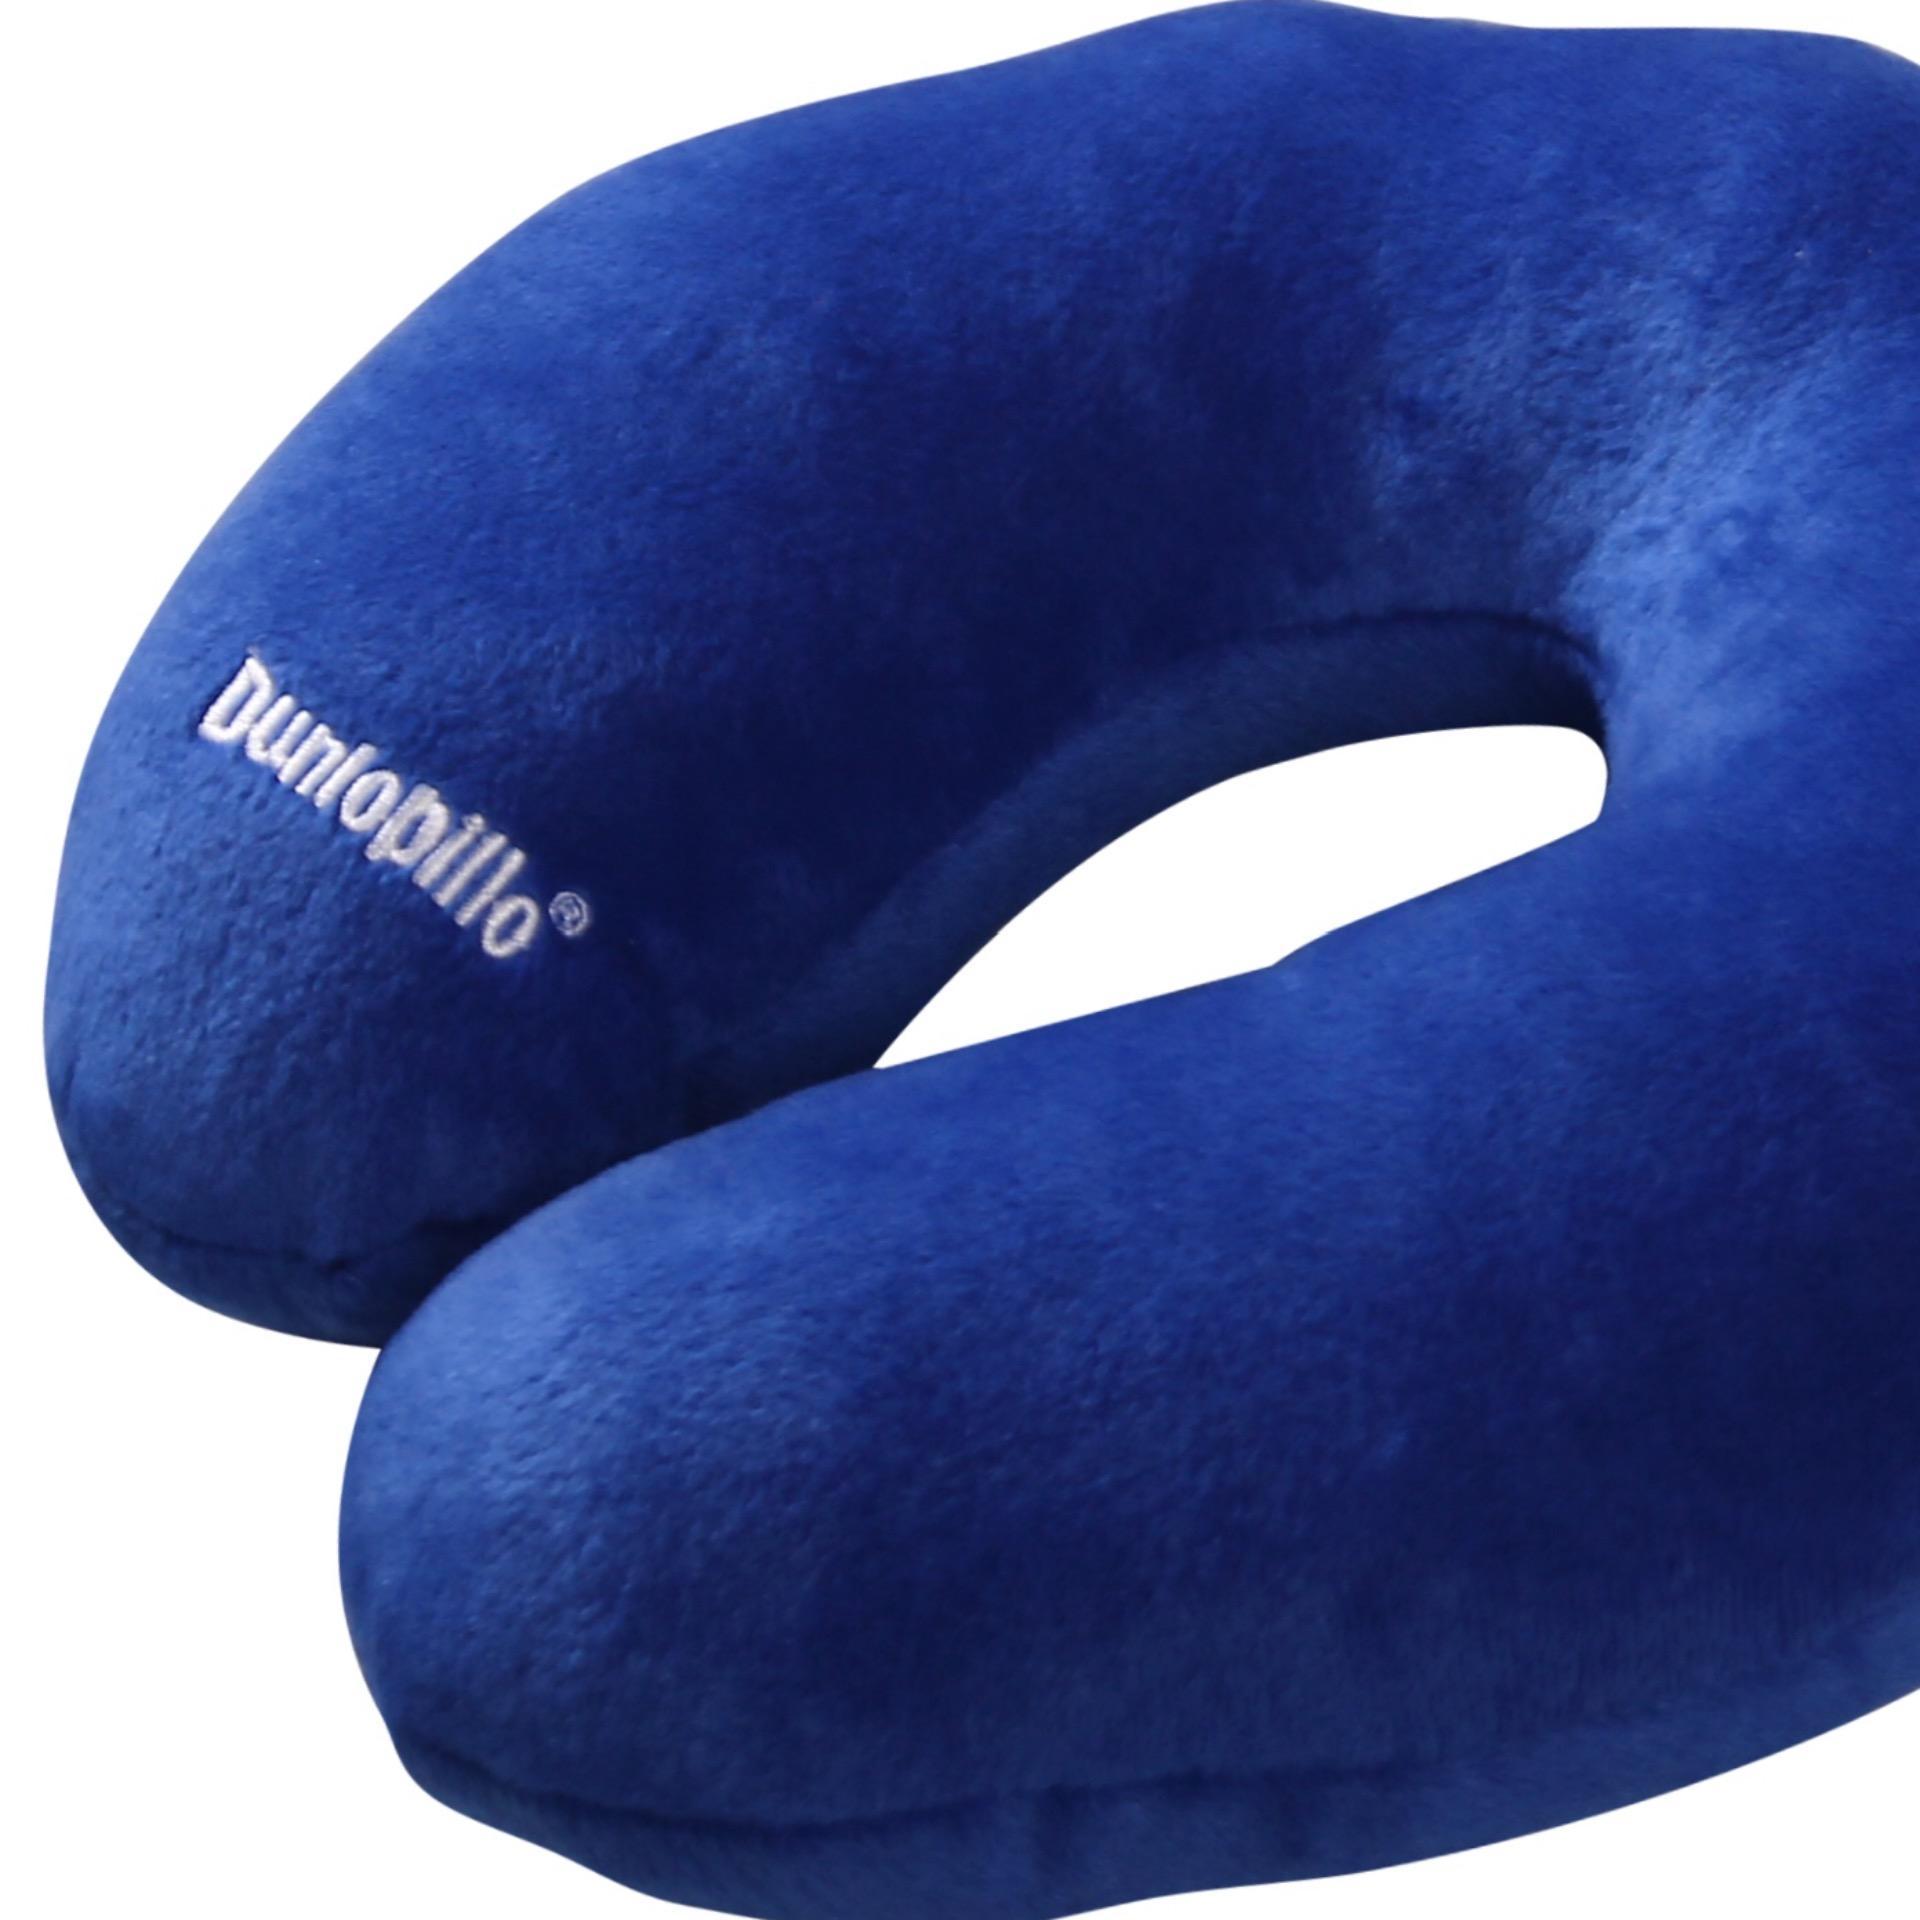 ... Dunlopillo Microlatex U neck Travel Pillow - 3 ...